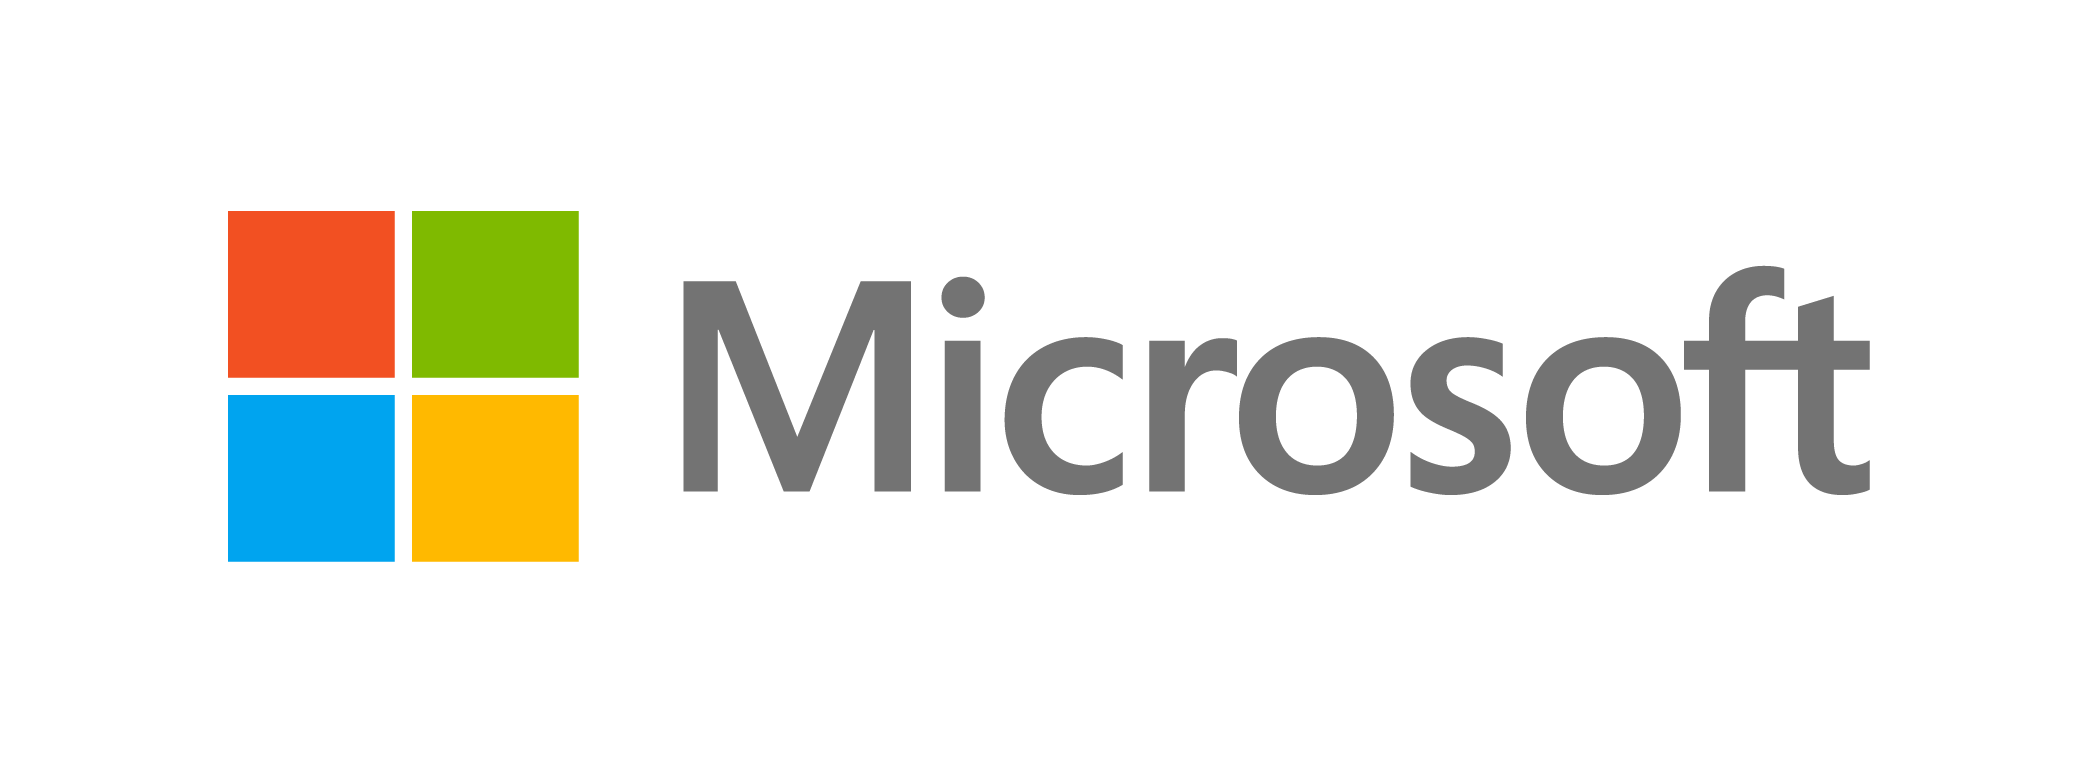 Microsoft Partner   Office 365 & Dynamics CRM